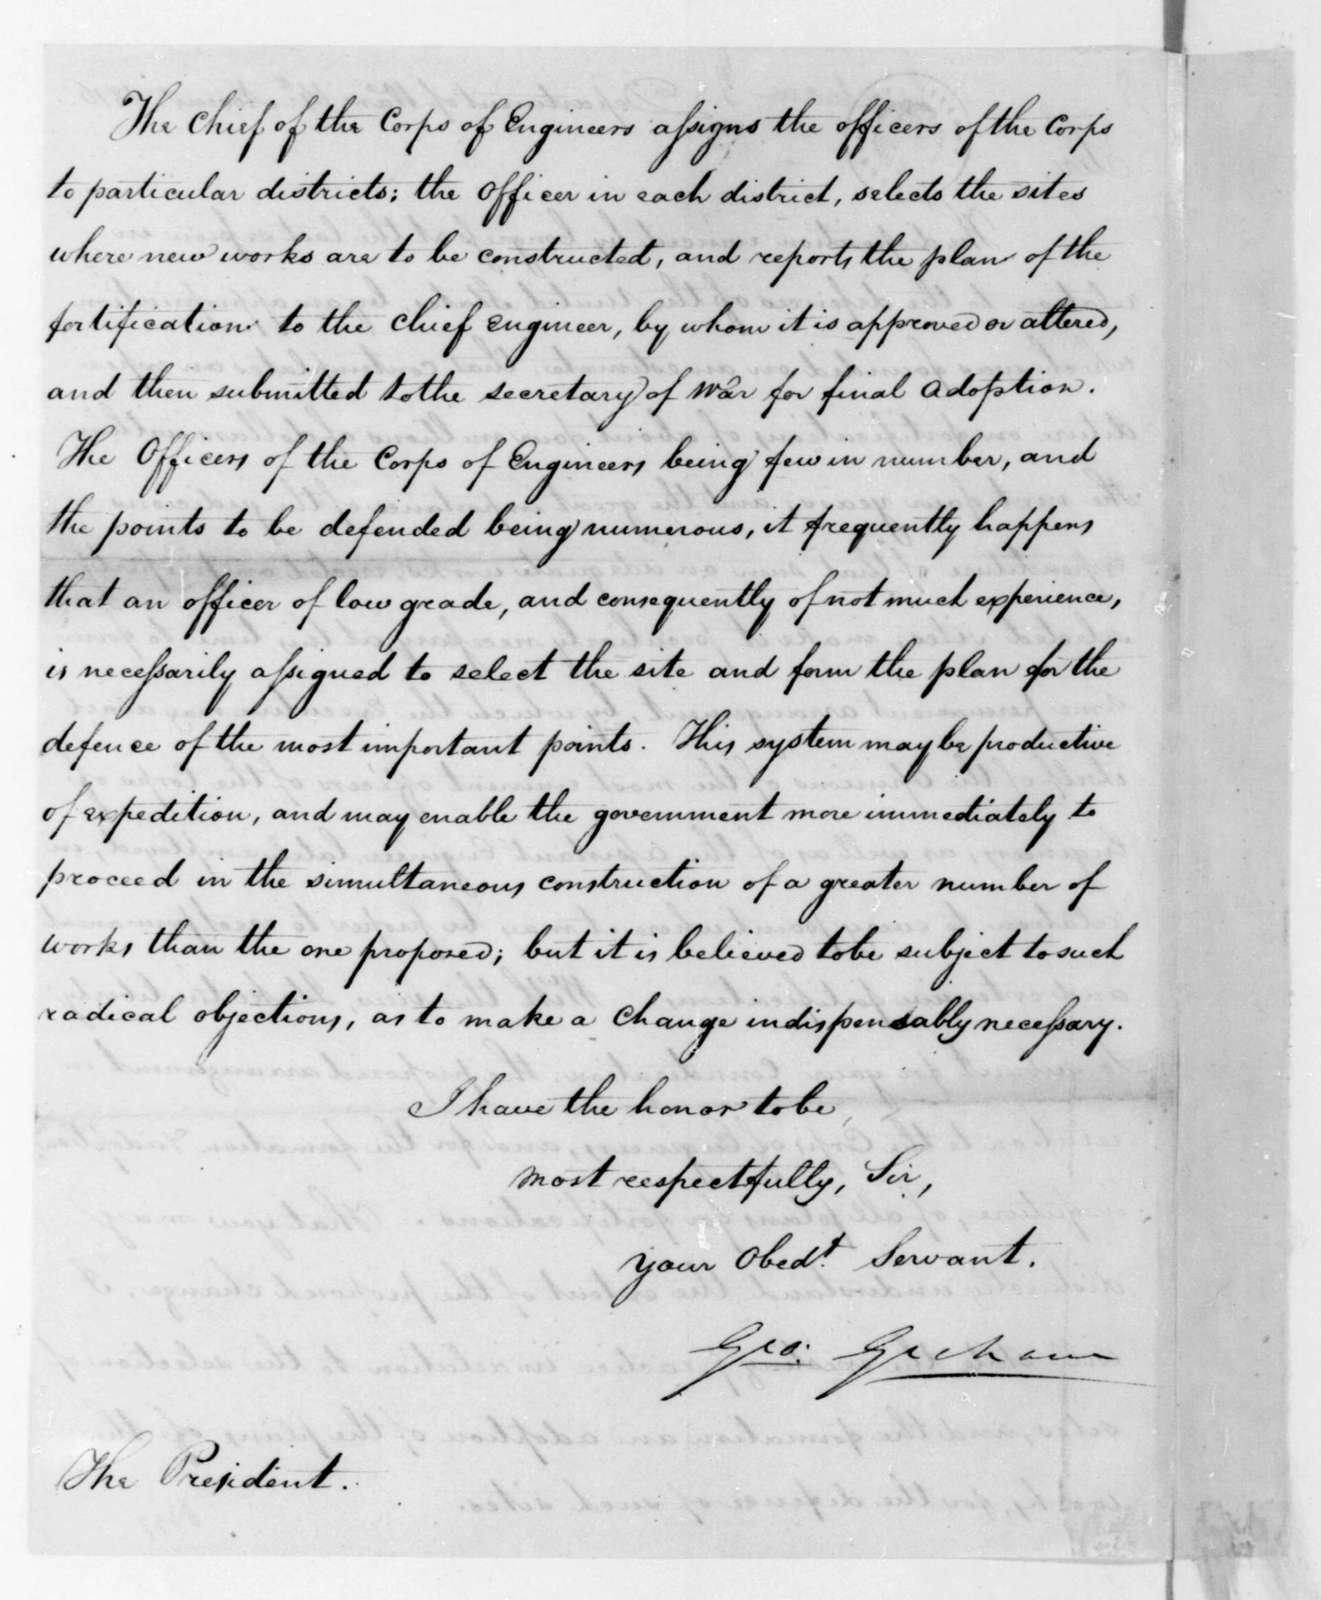 George Graham to James Madison, November 14, 1816.